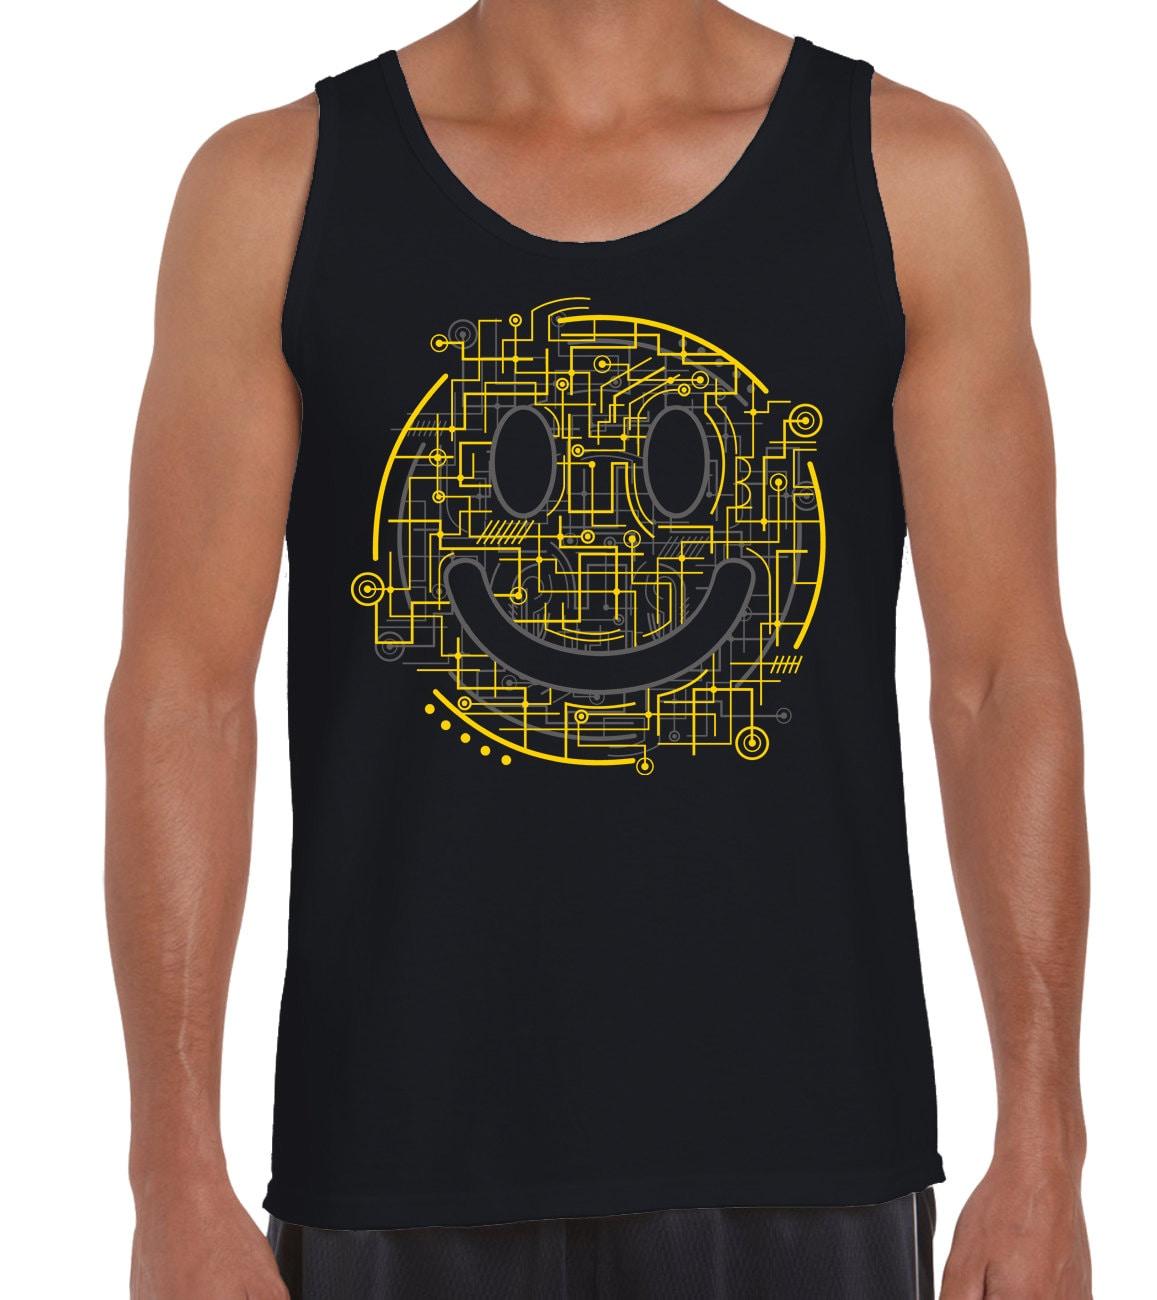 Electric Smiley Acid Face Mens Vest Tank Top  House Music Rave Festival Ibiza